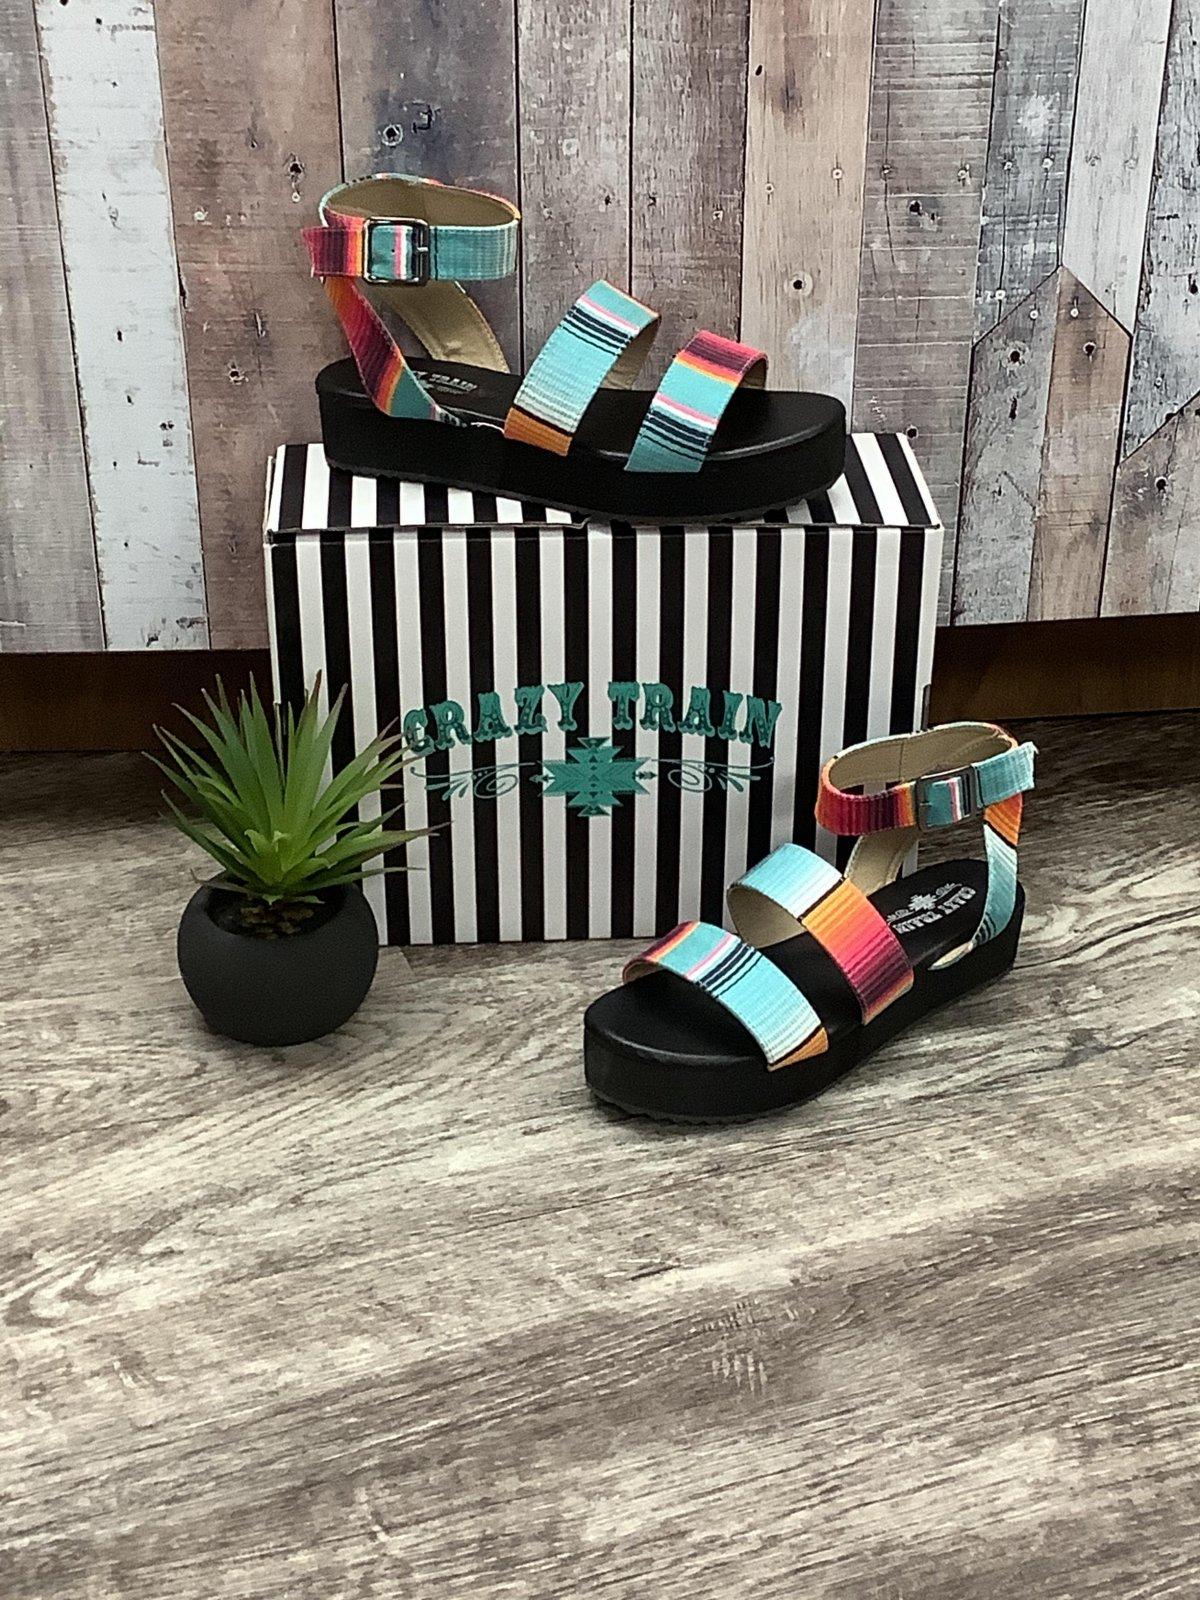 Turquoise Blanket Serape Sandal